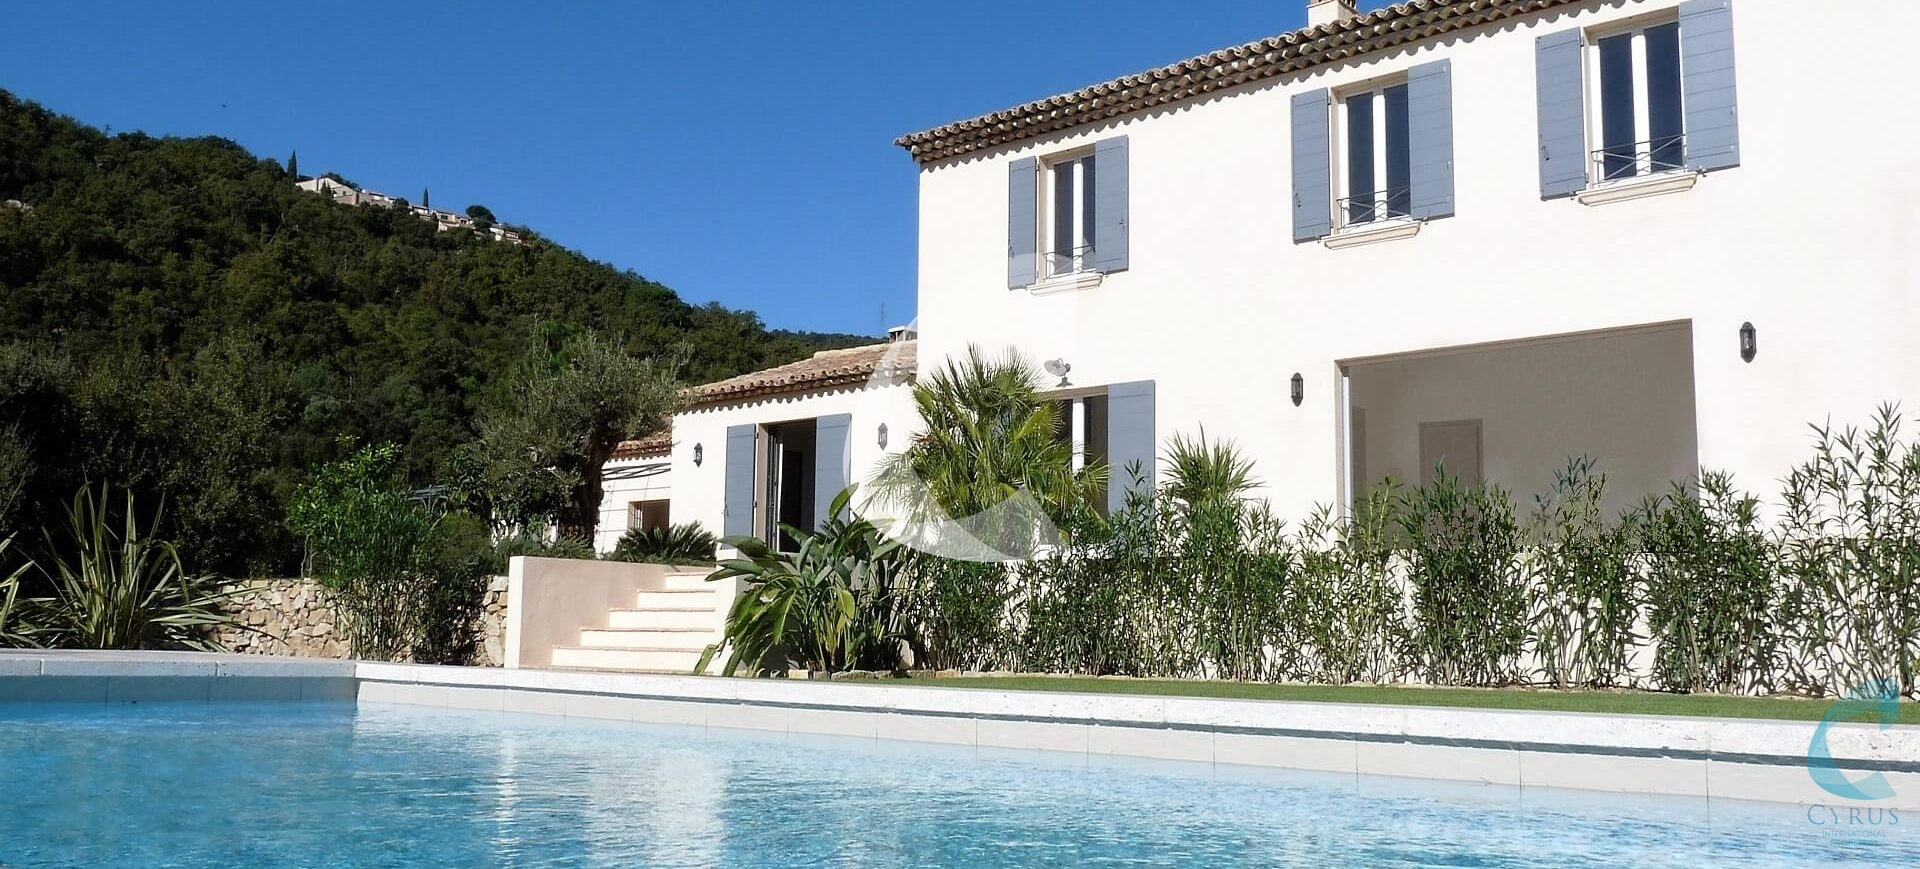 Hotel Saint-Tropez pool